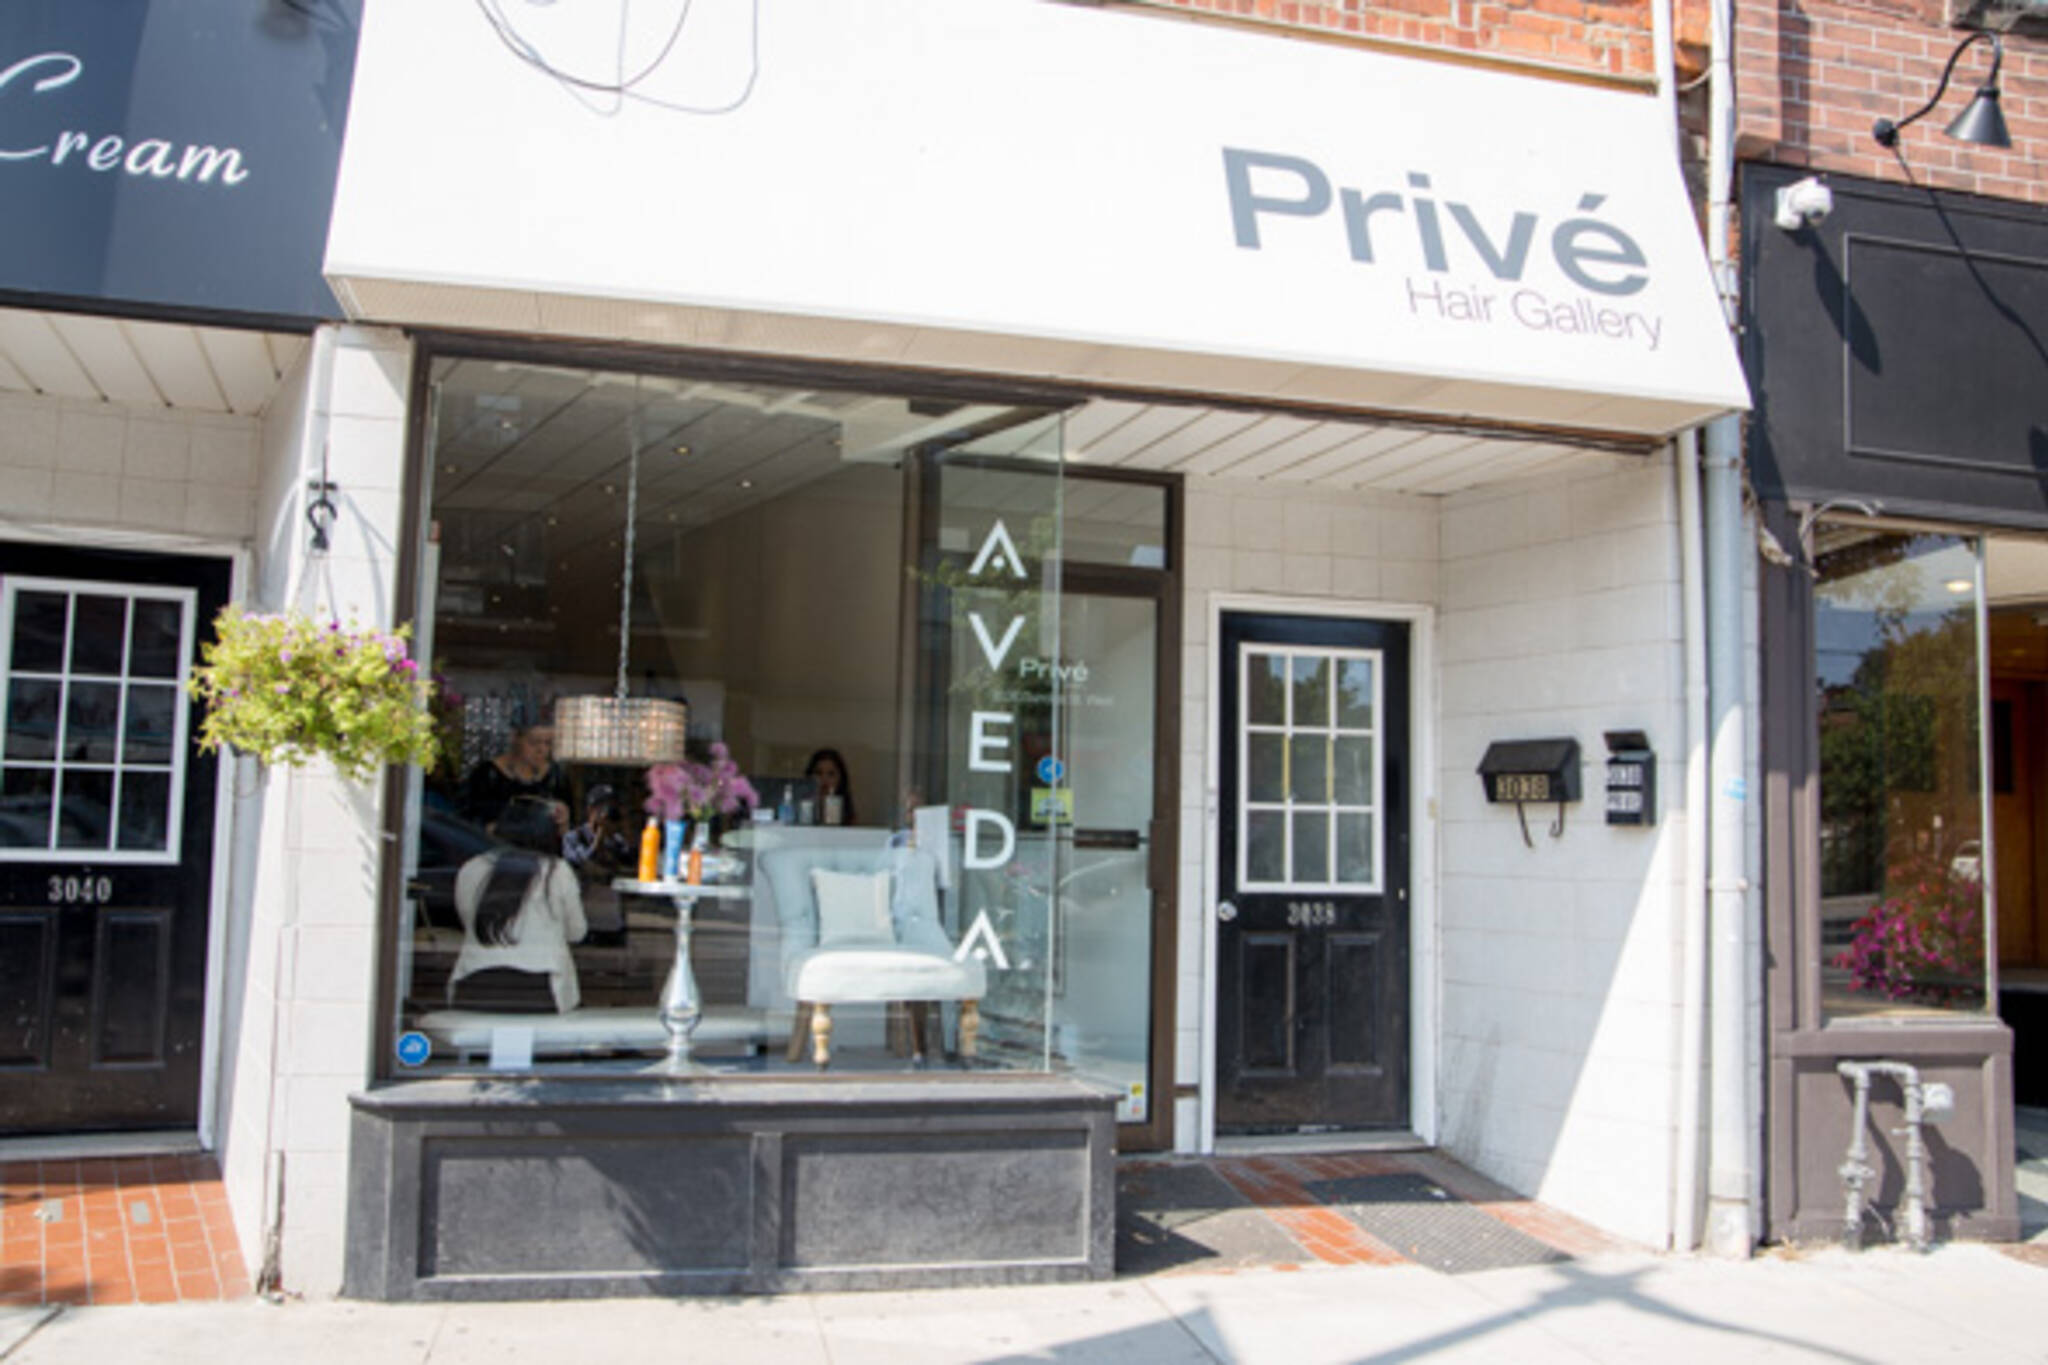 Prive Hair Gallery Toronto